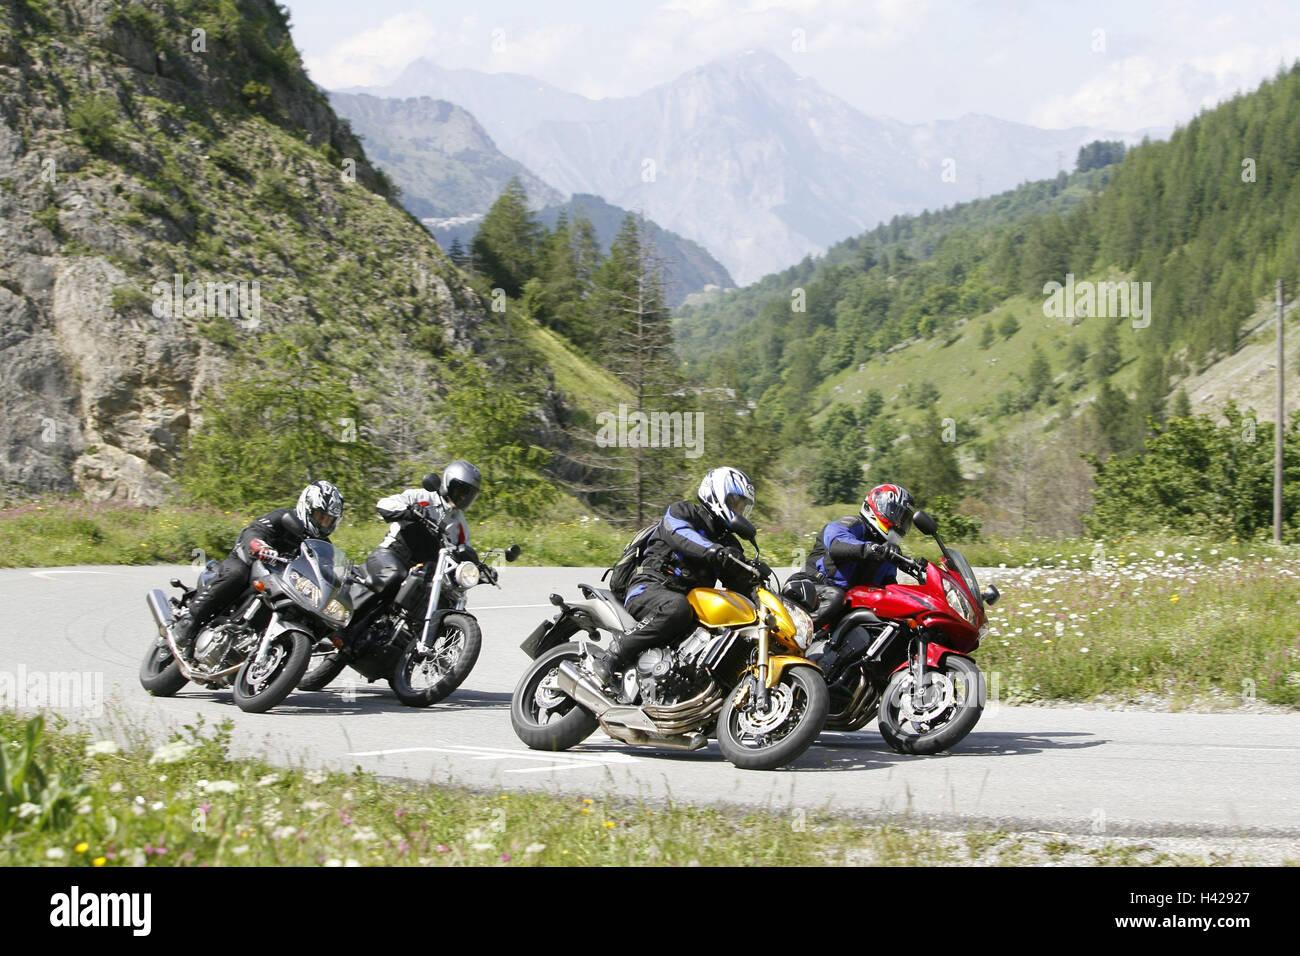 Les motocyclettes, 4e formation, alp scenery Banque D'Images